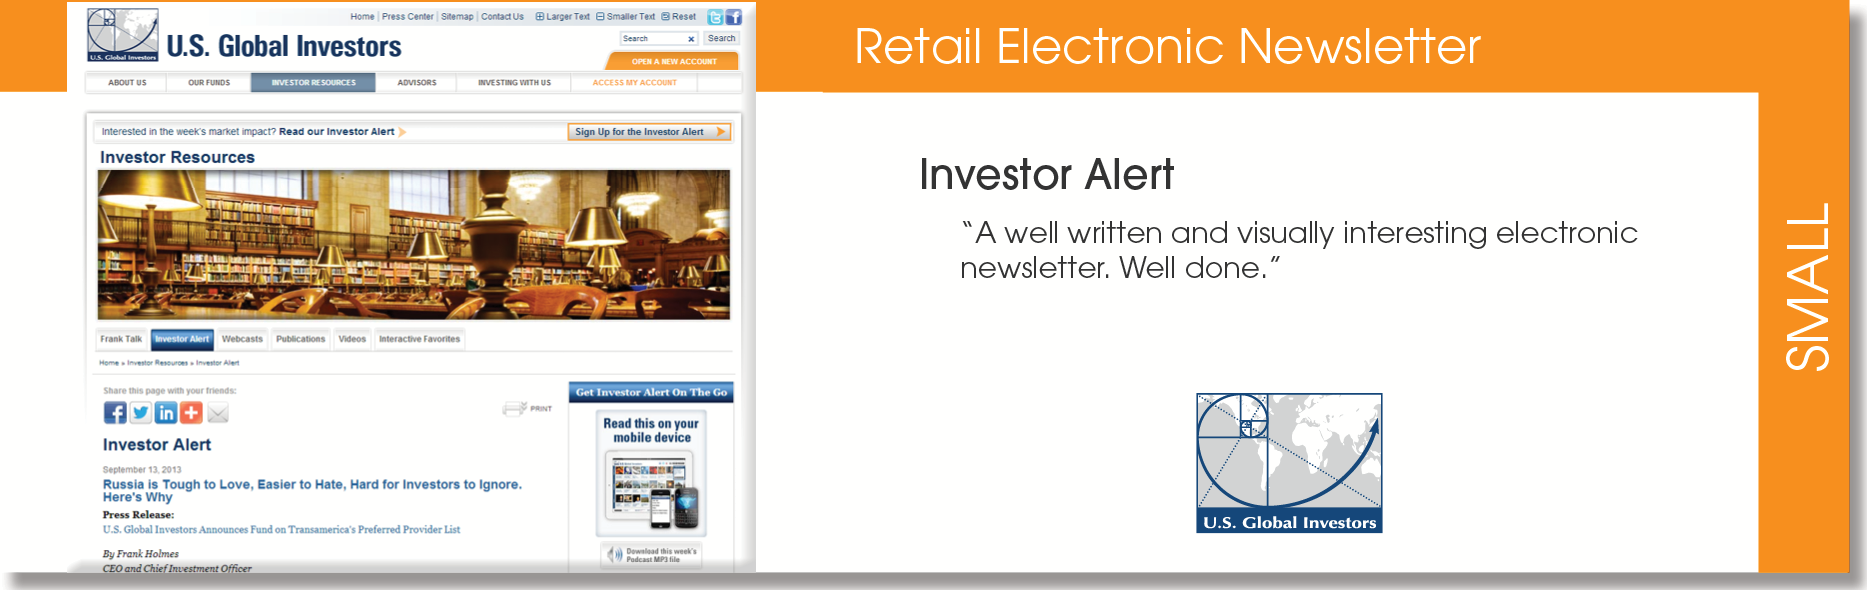 Small Retail Winner Image8